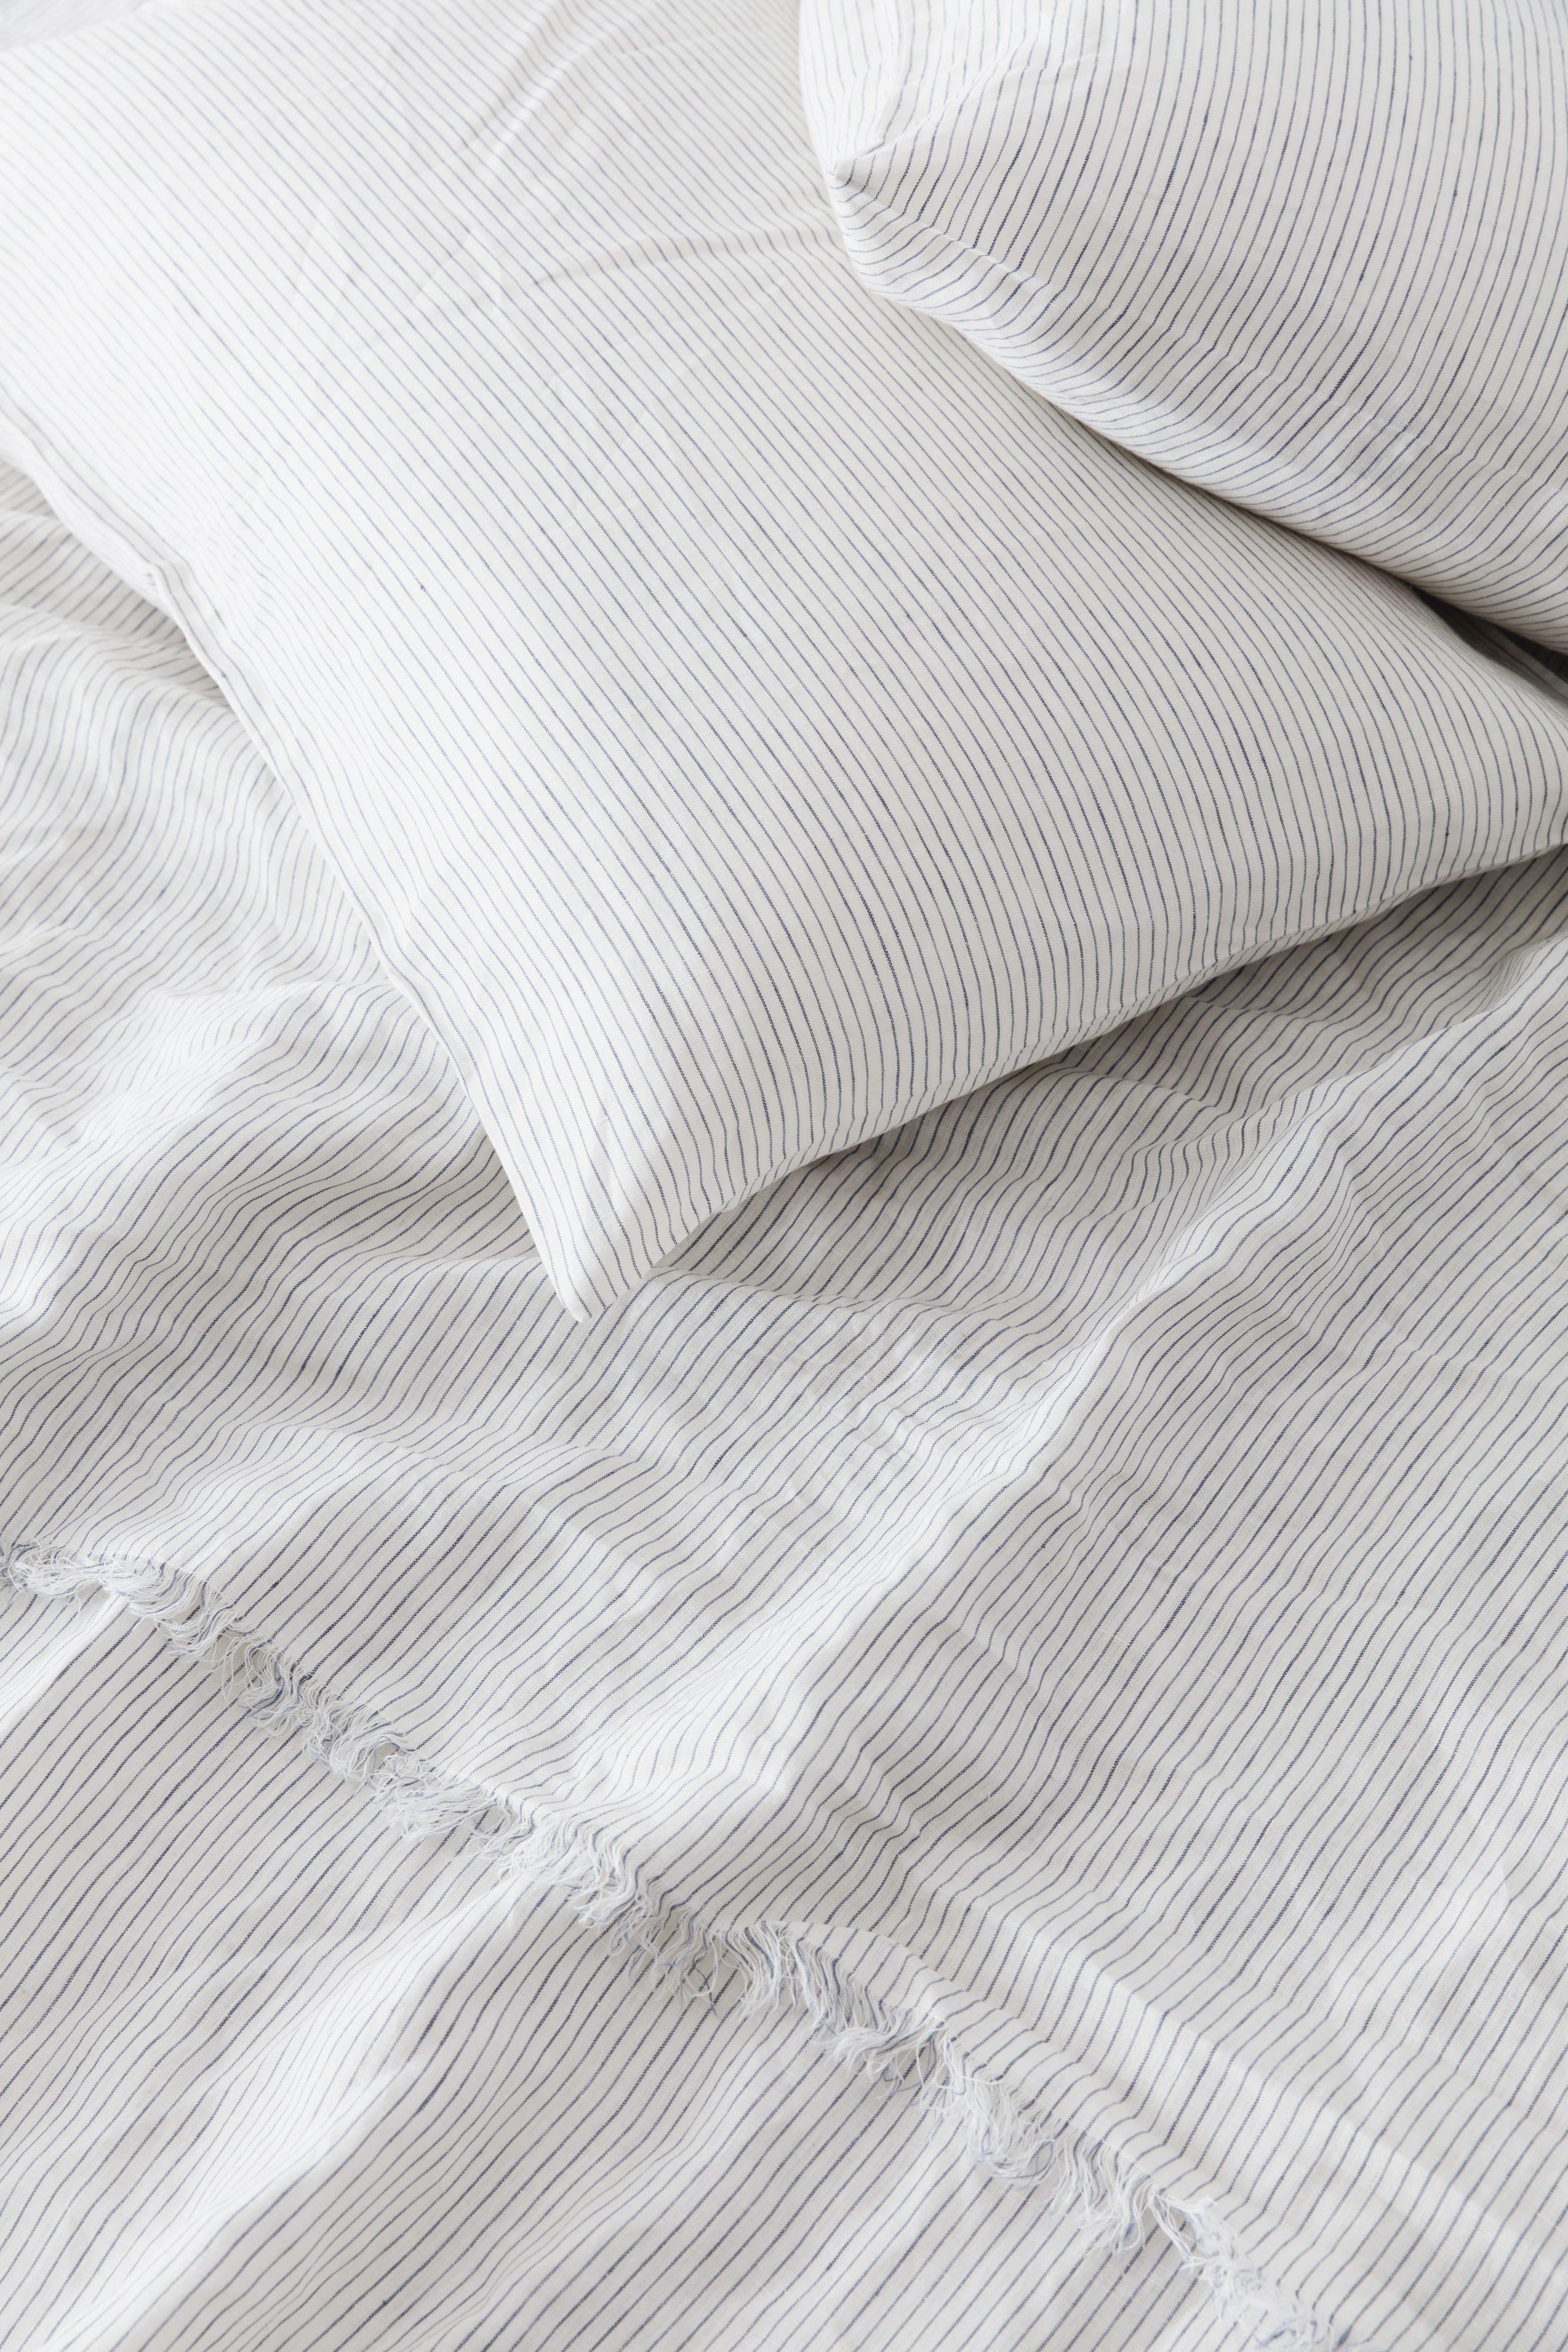 Blue stripe sheet set with delicate eyelash fringing details